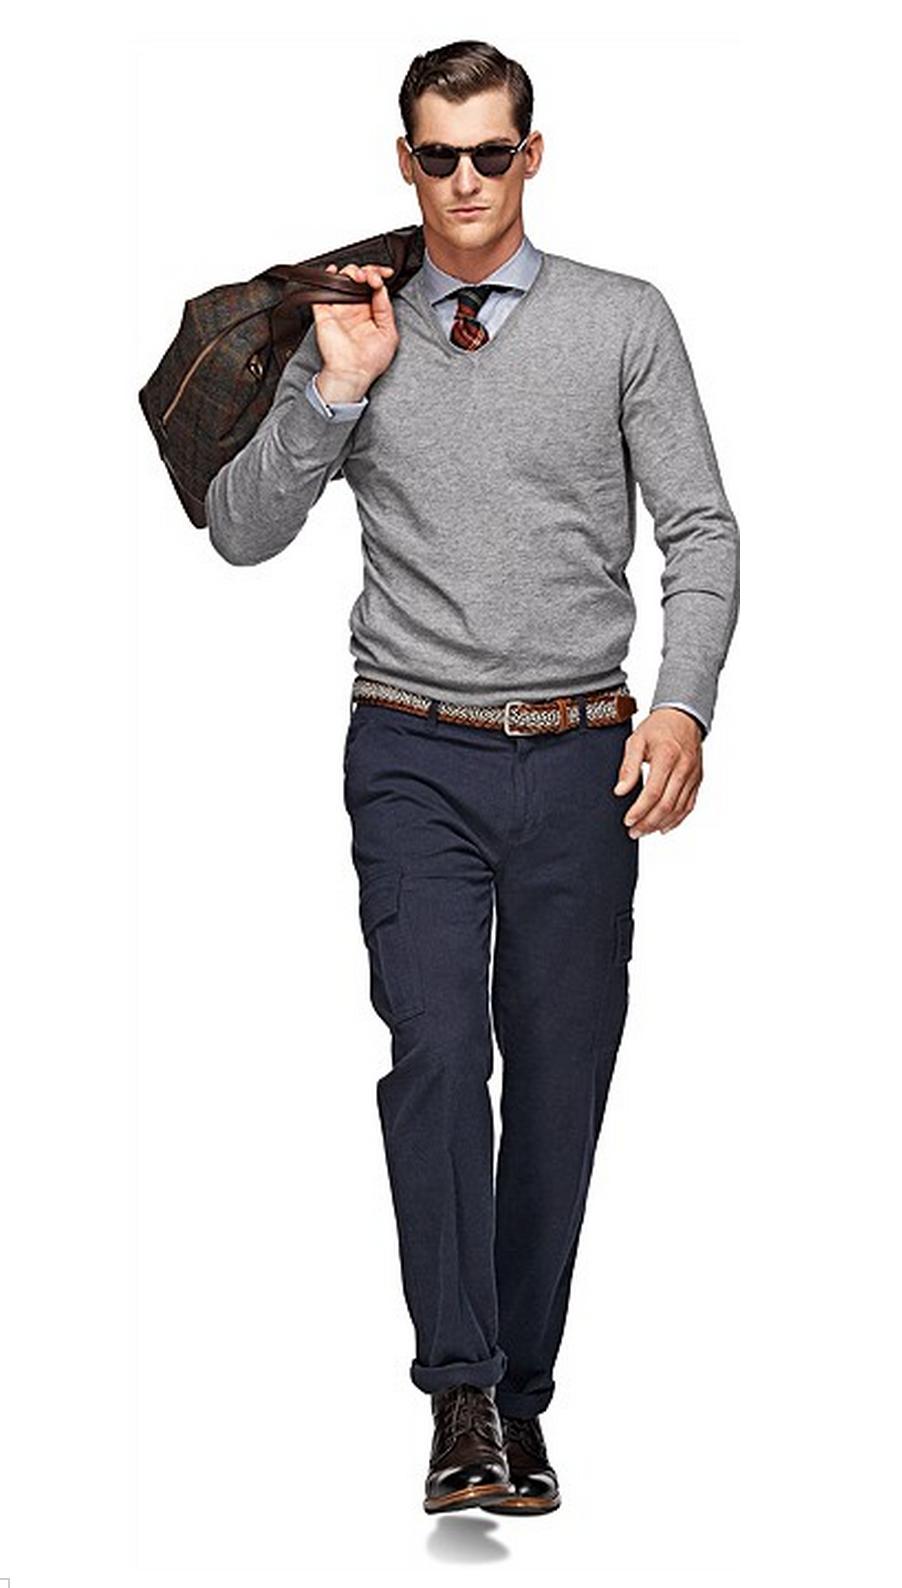 Light Grey V Neck Man Outfit Mens Fashion Fashion Menswear